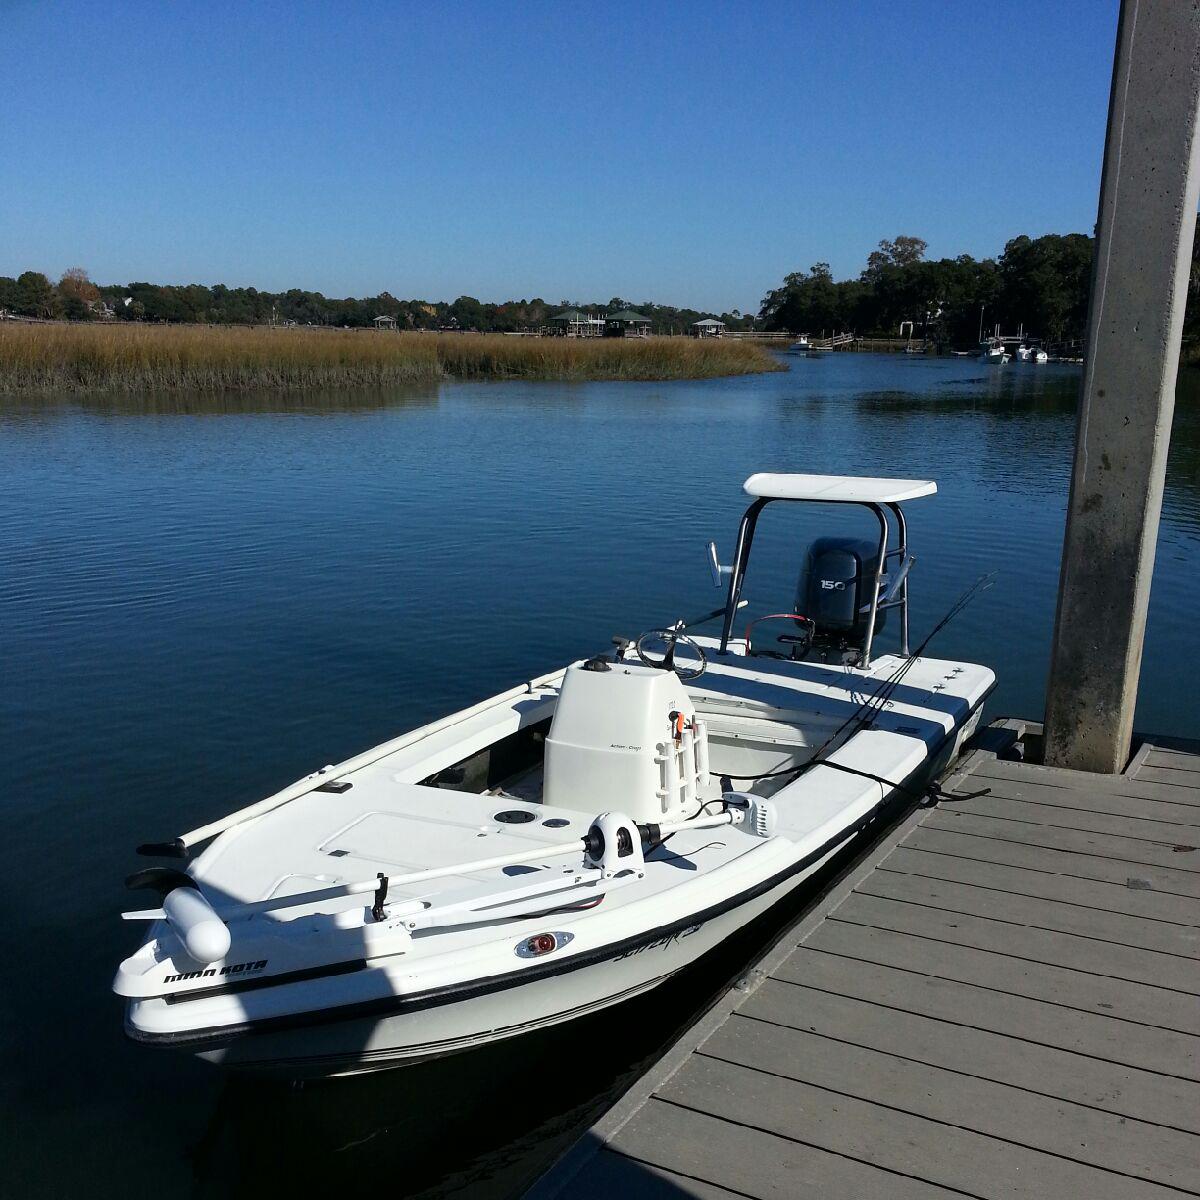 Lee's Boat